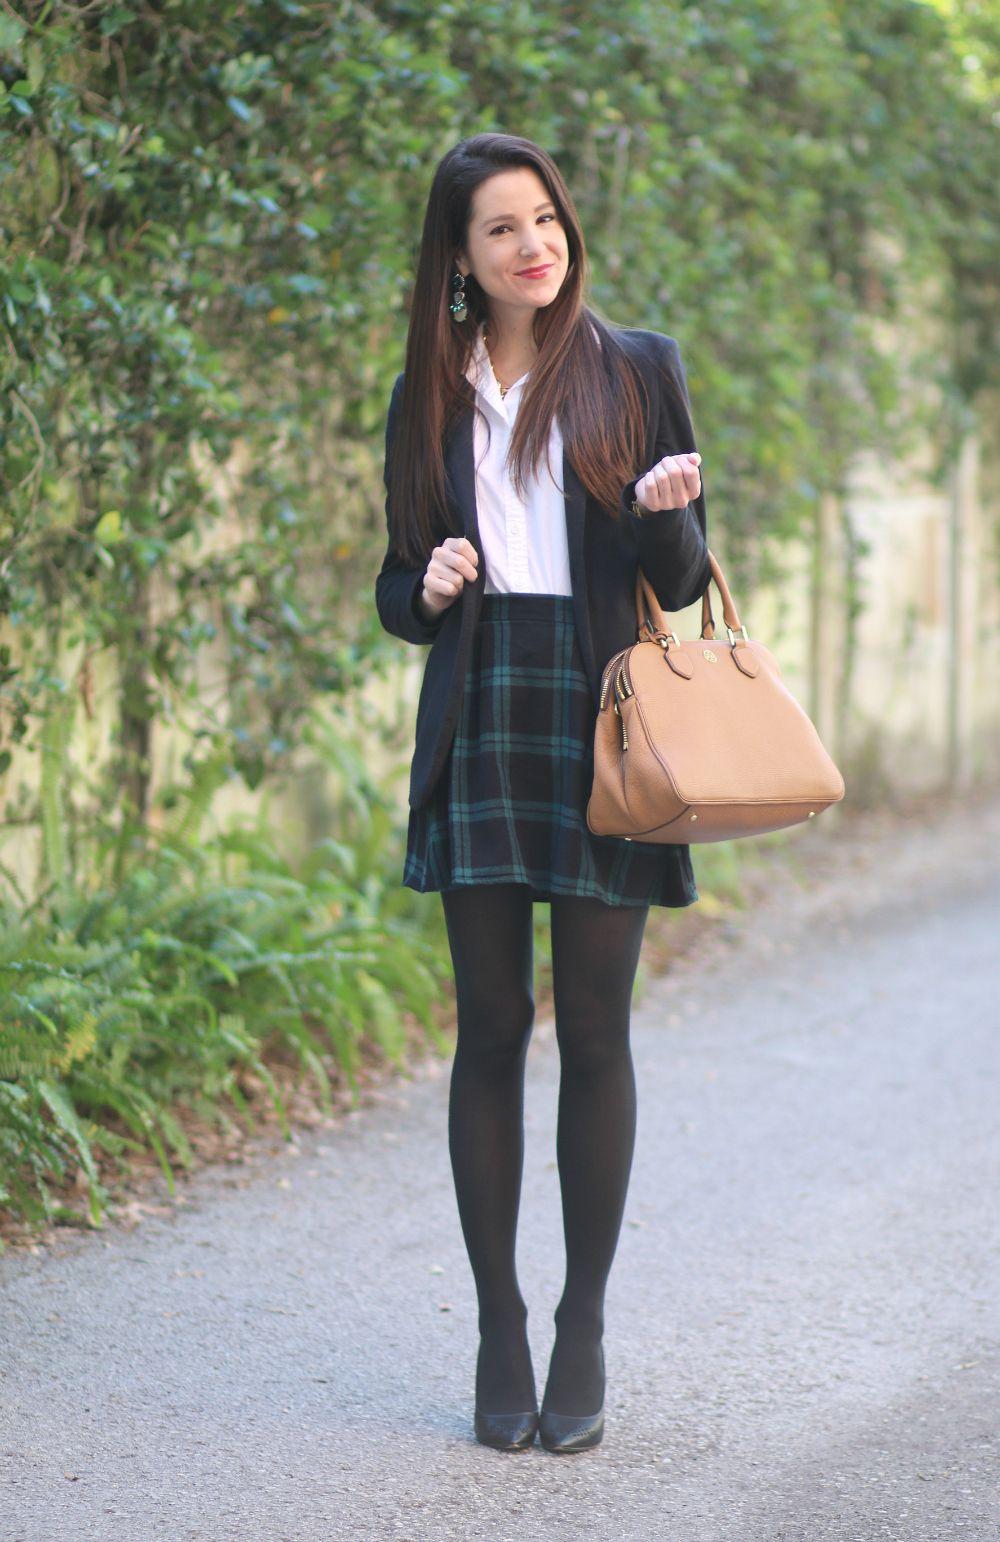 Black Plaid Skirt, Black Blazer, Prep School Look -3837